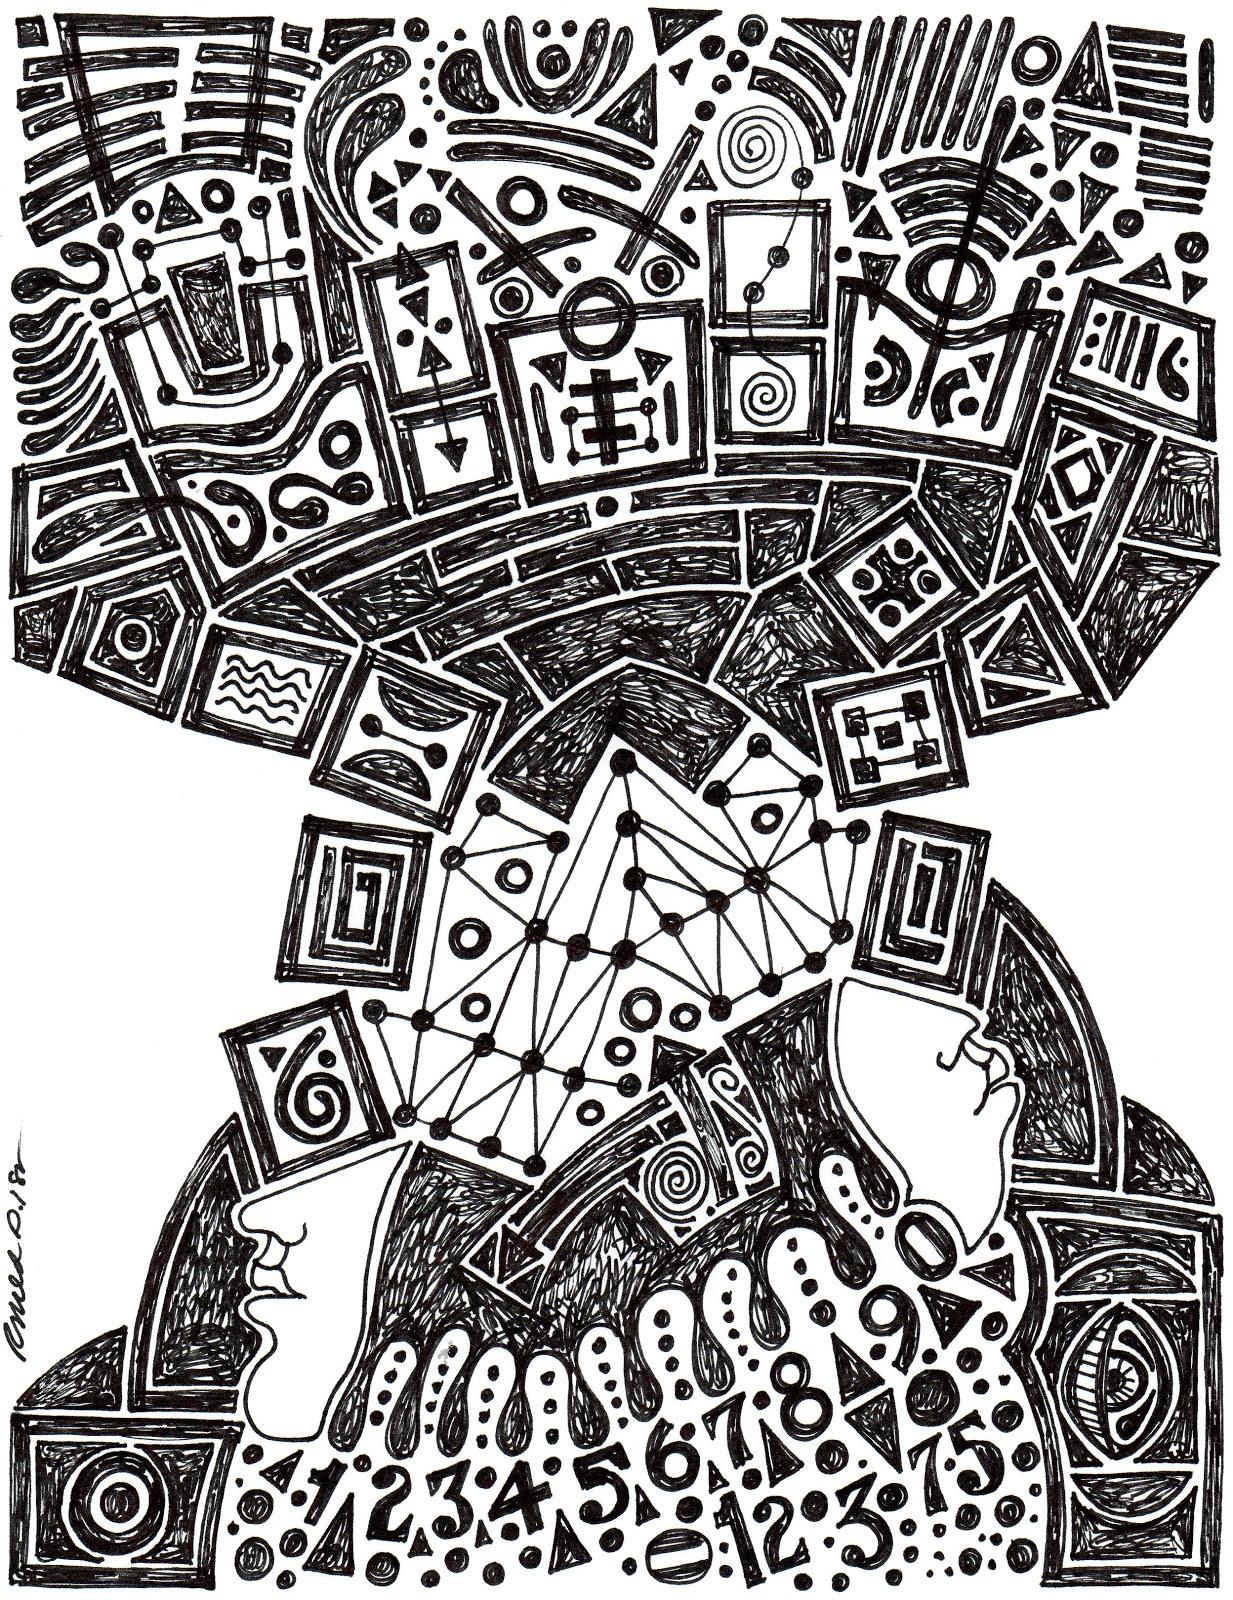 Ronald d isom sr process of rebirth process of rebirth paralyzing sense of guilt buycottarizona Gallery